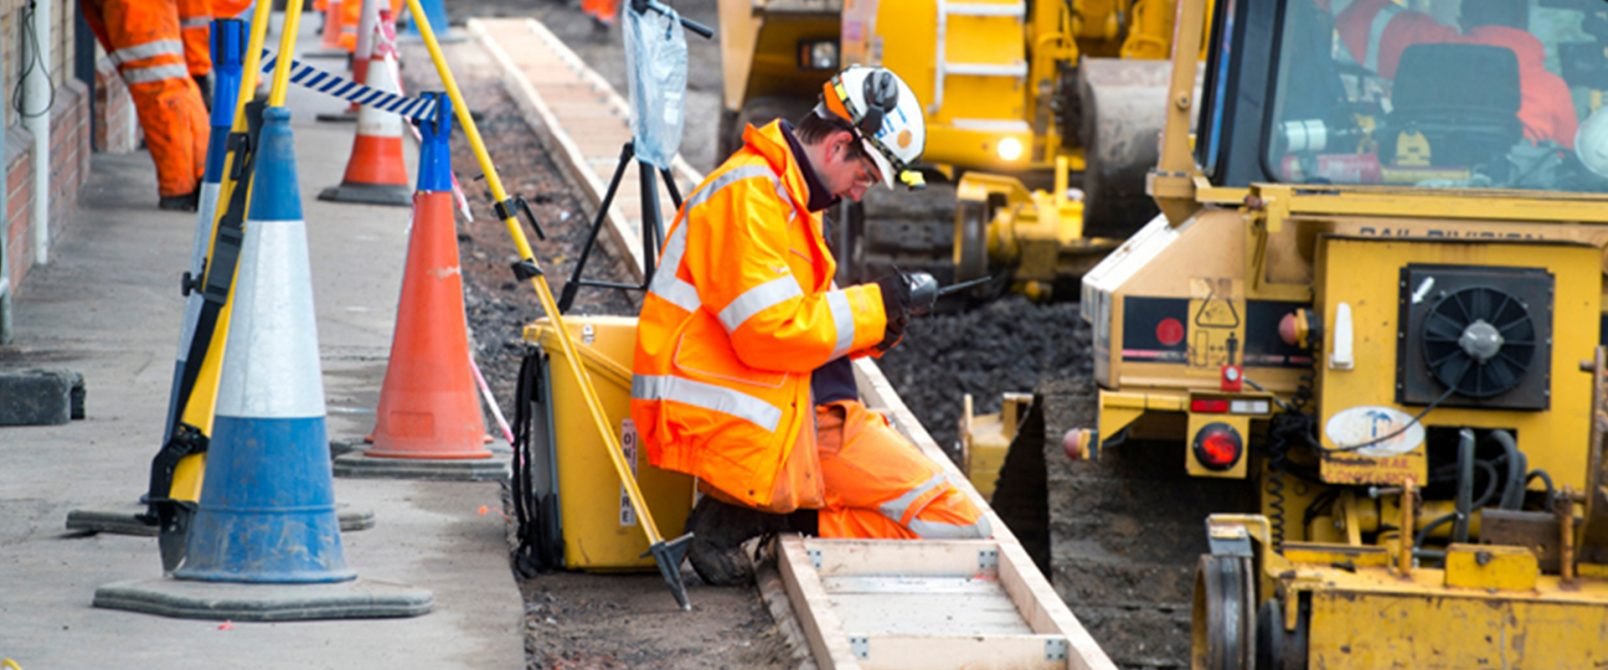 Apprentice_Matt-Evans-Rail_002